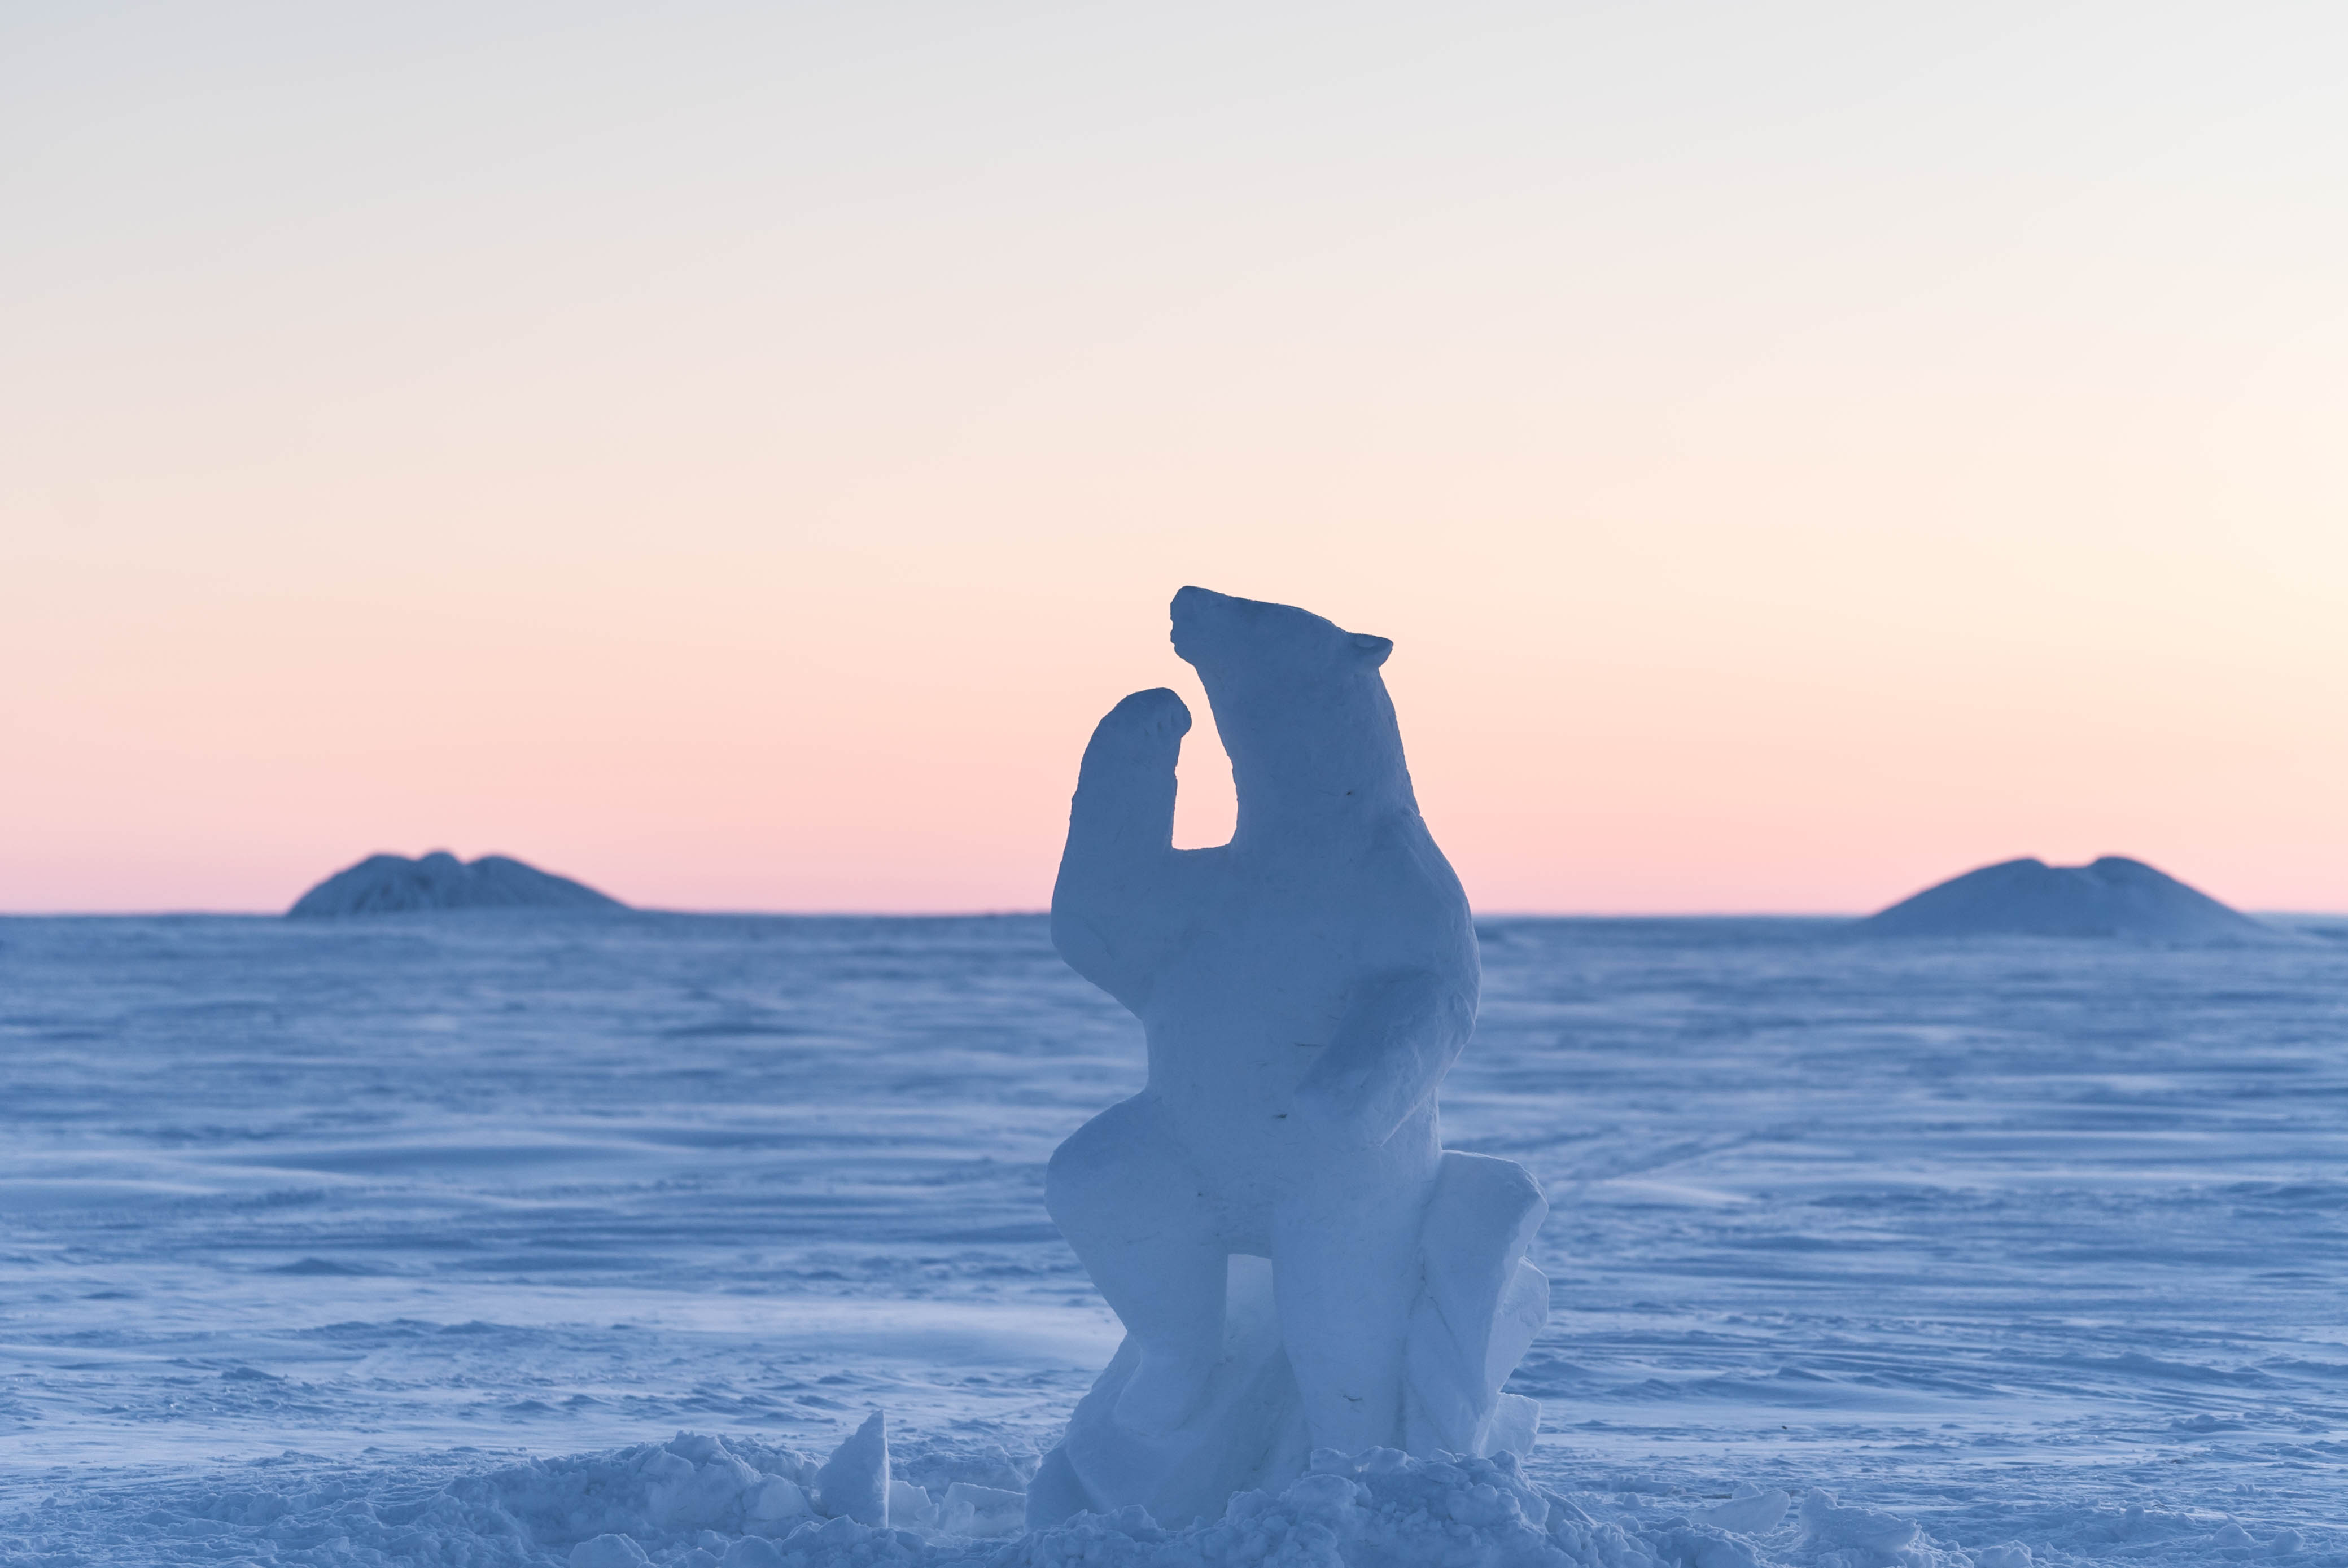 Derrald Taylor polar bear snow carving